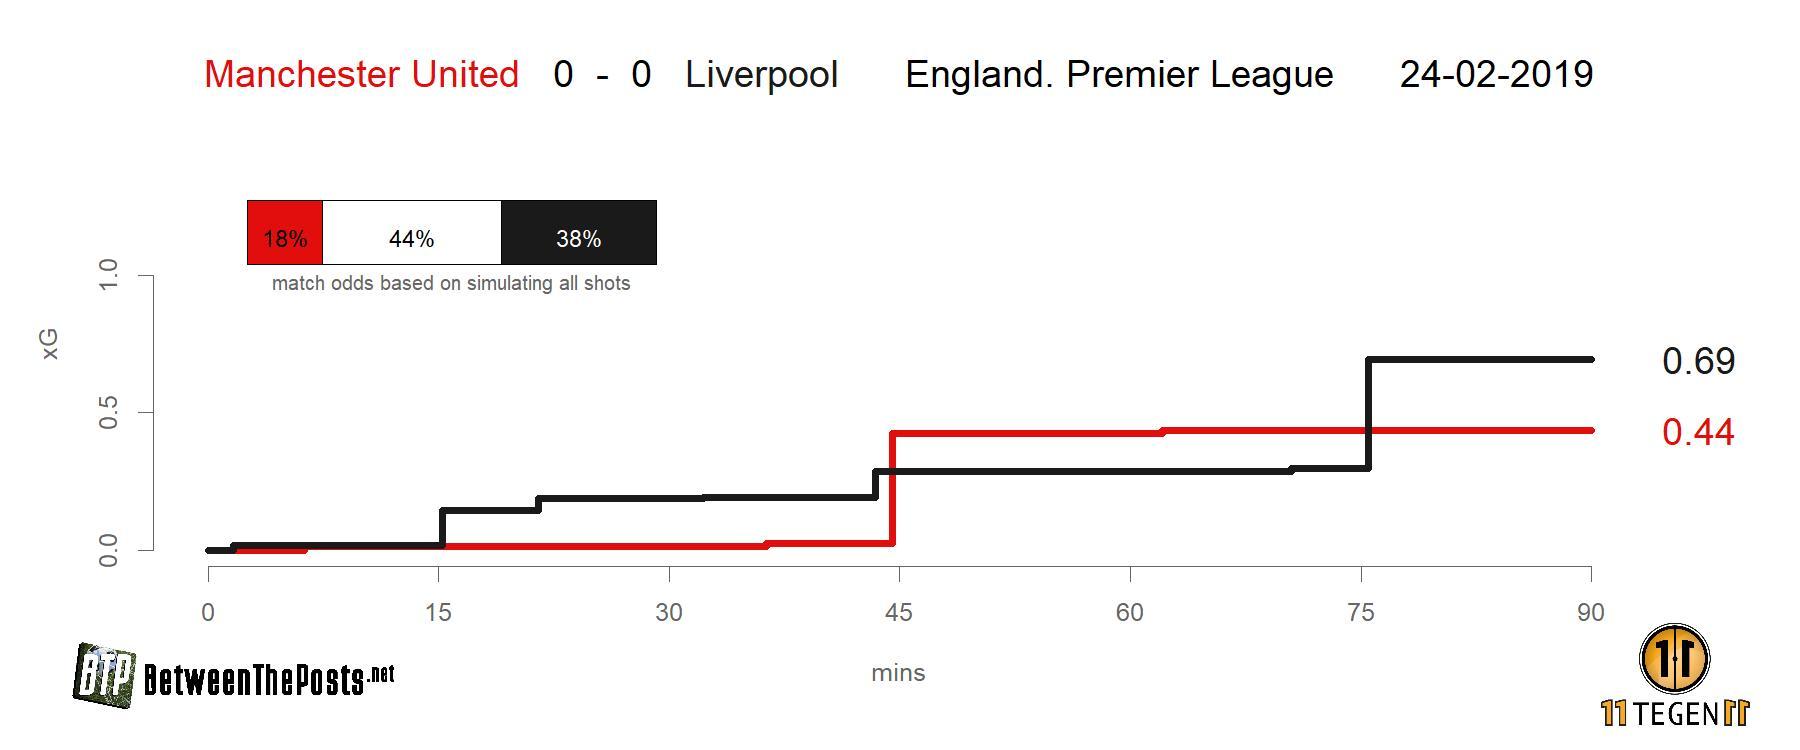 Expected goals plot Manchester United - Liverpool 0-0 Premier League